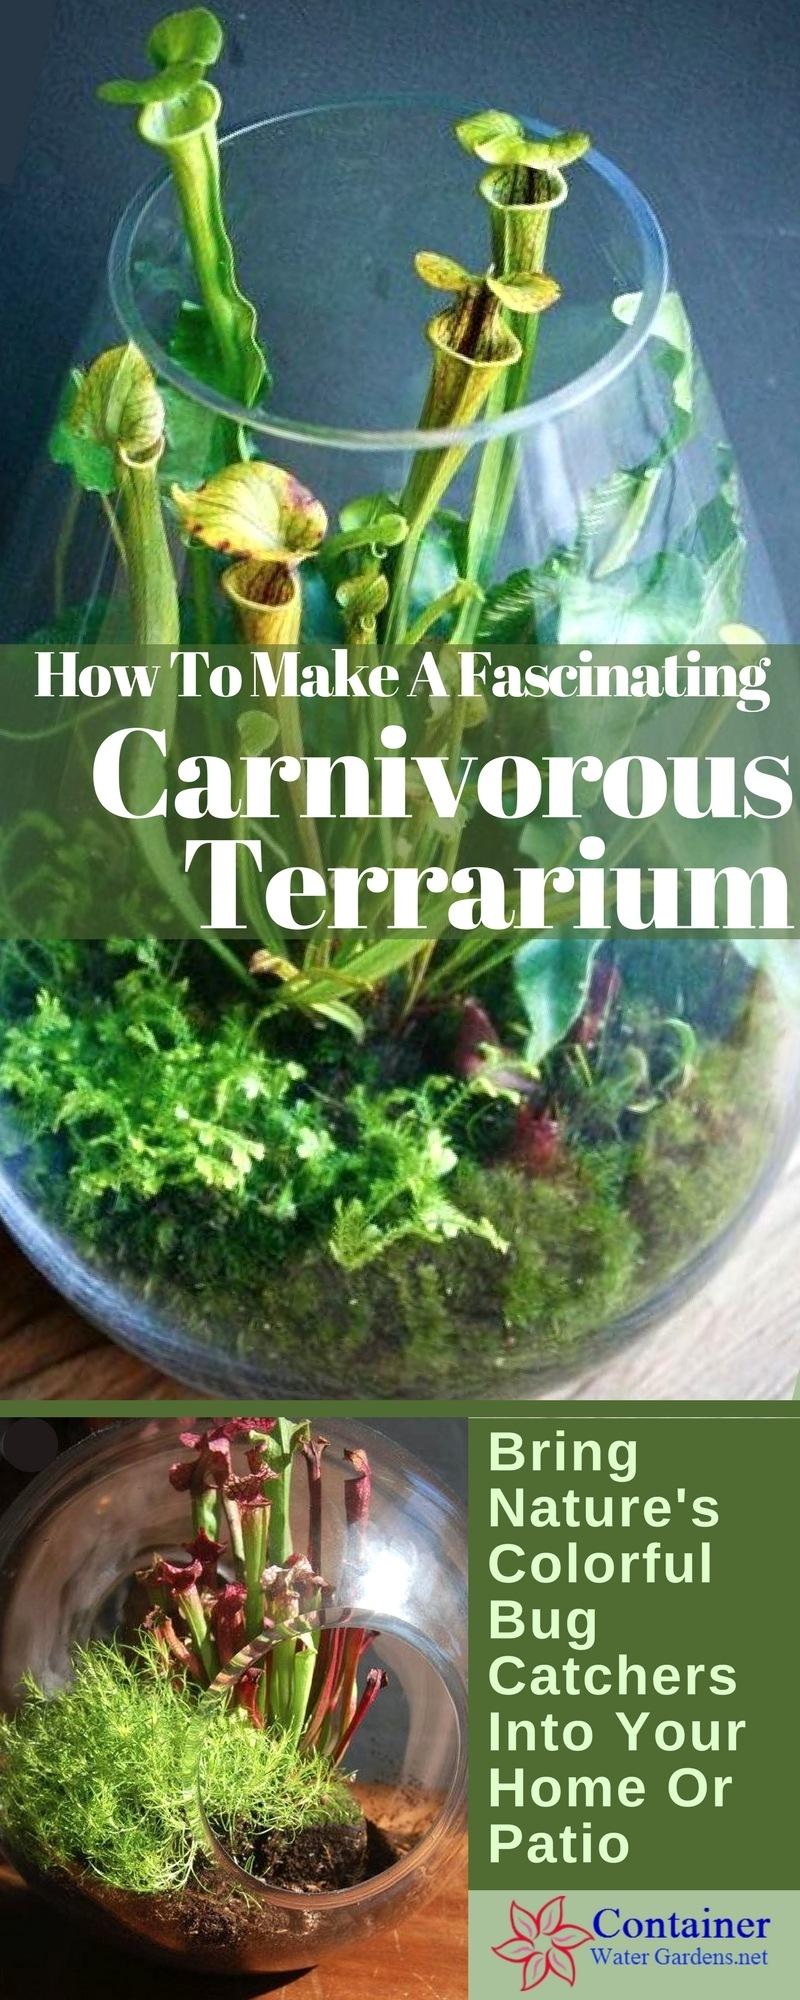 Create A Fascinating Carnivorous Terrarium Container Water Gardens